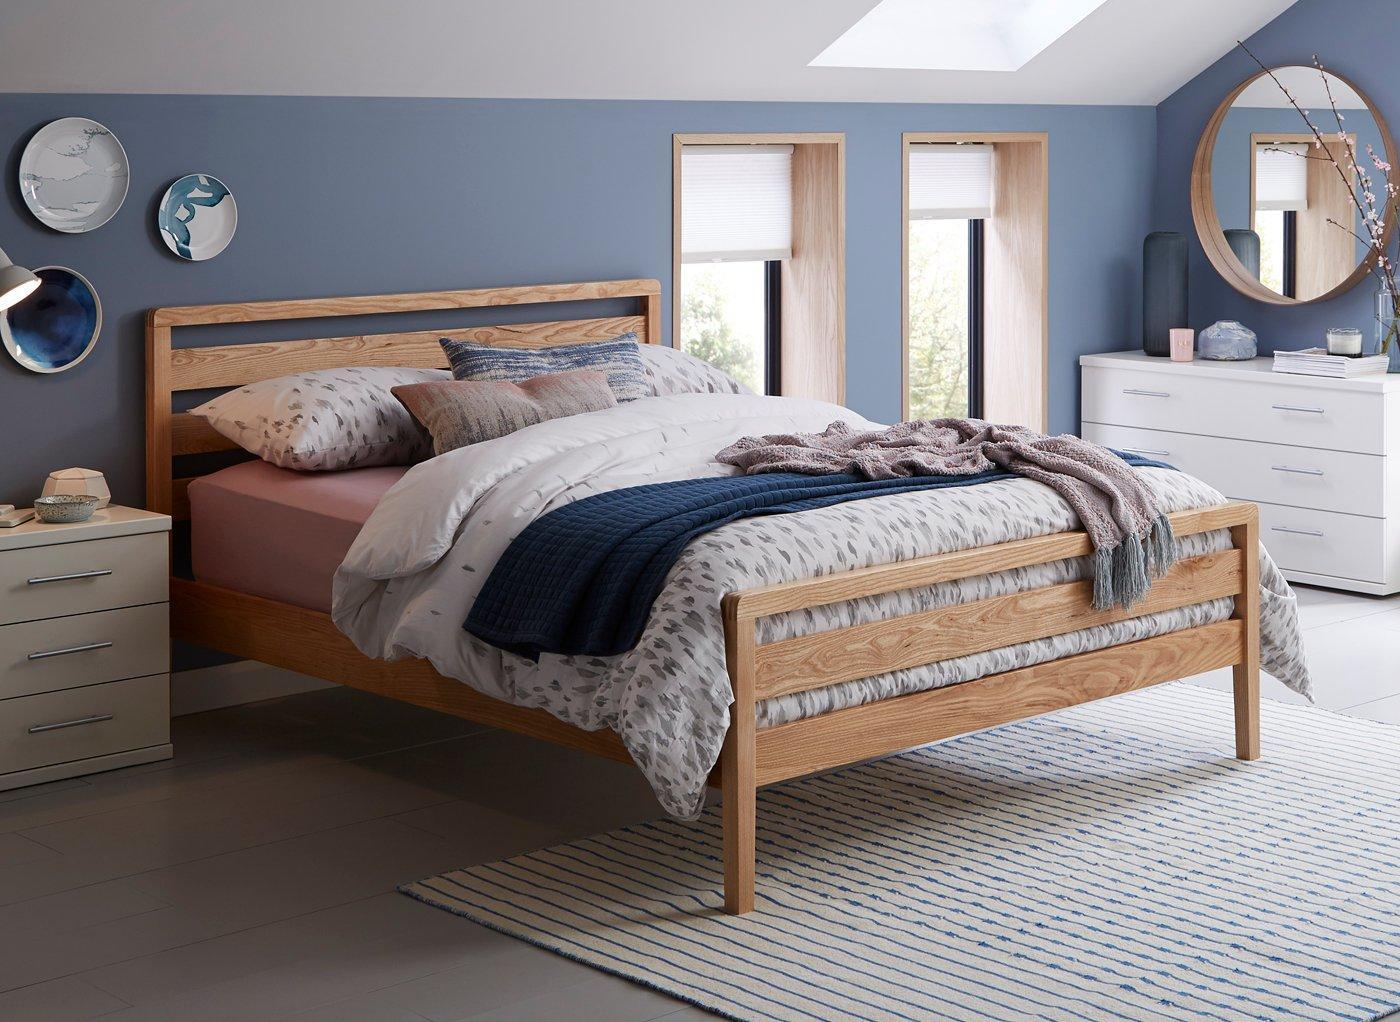 woodstock-wooden-bed-frame